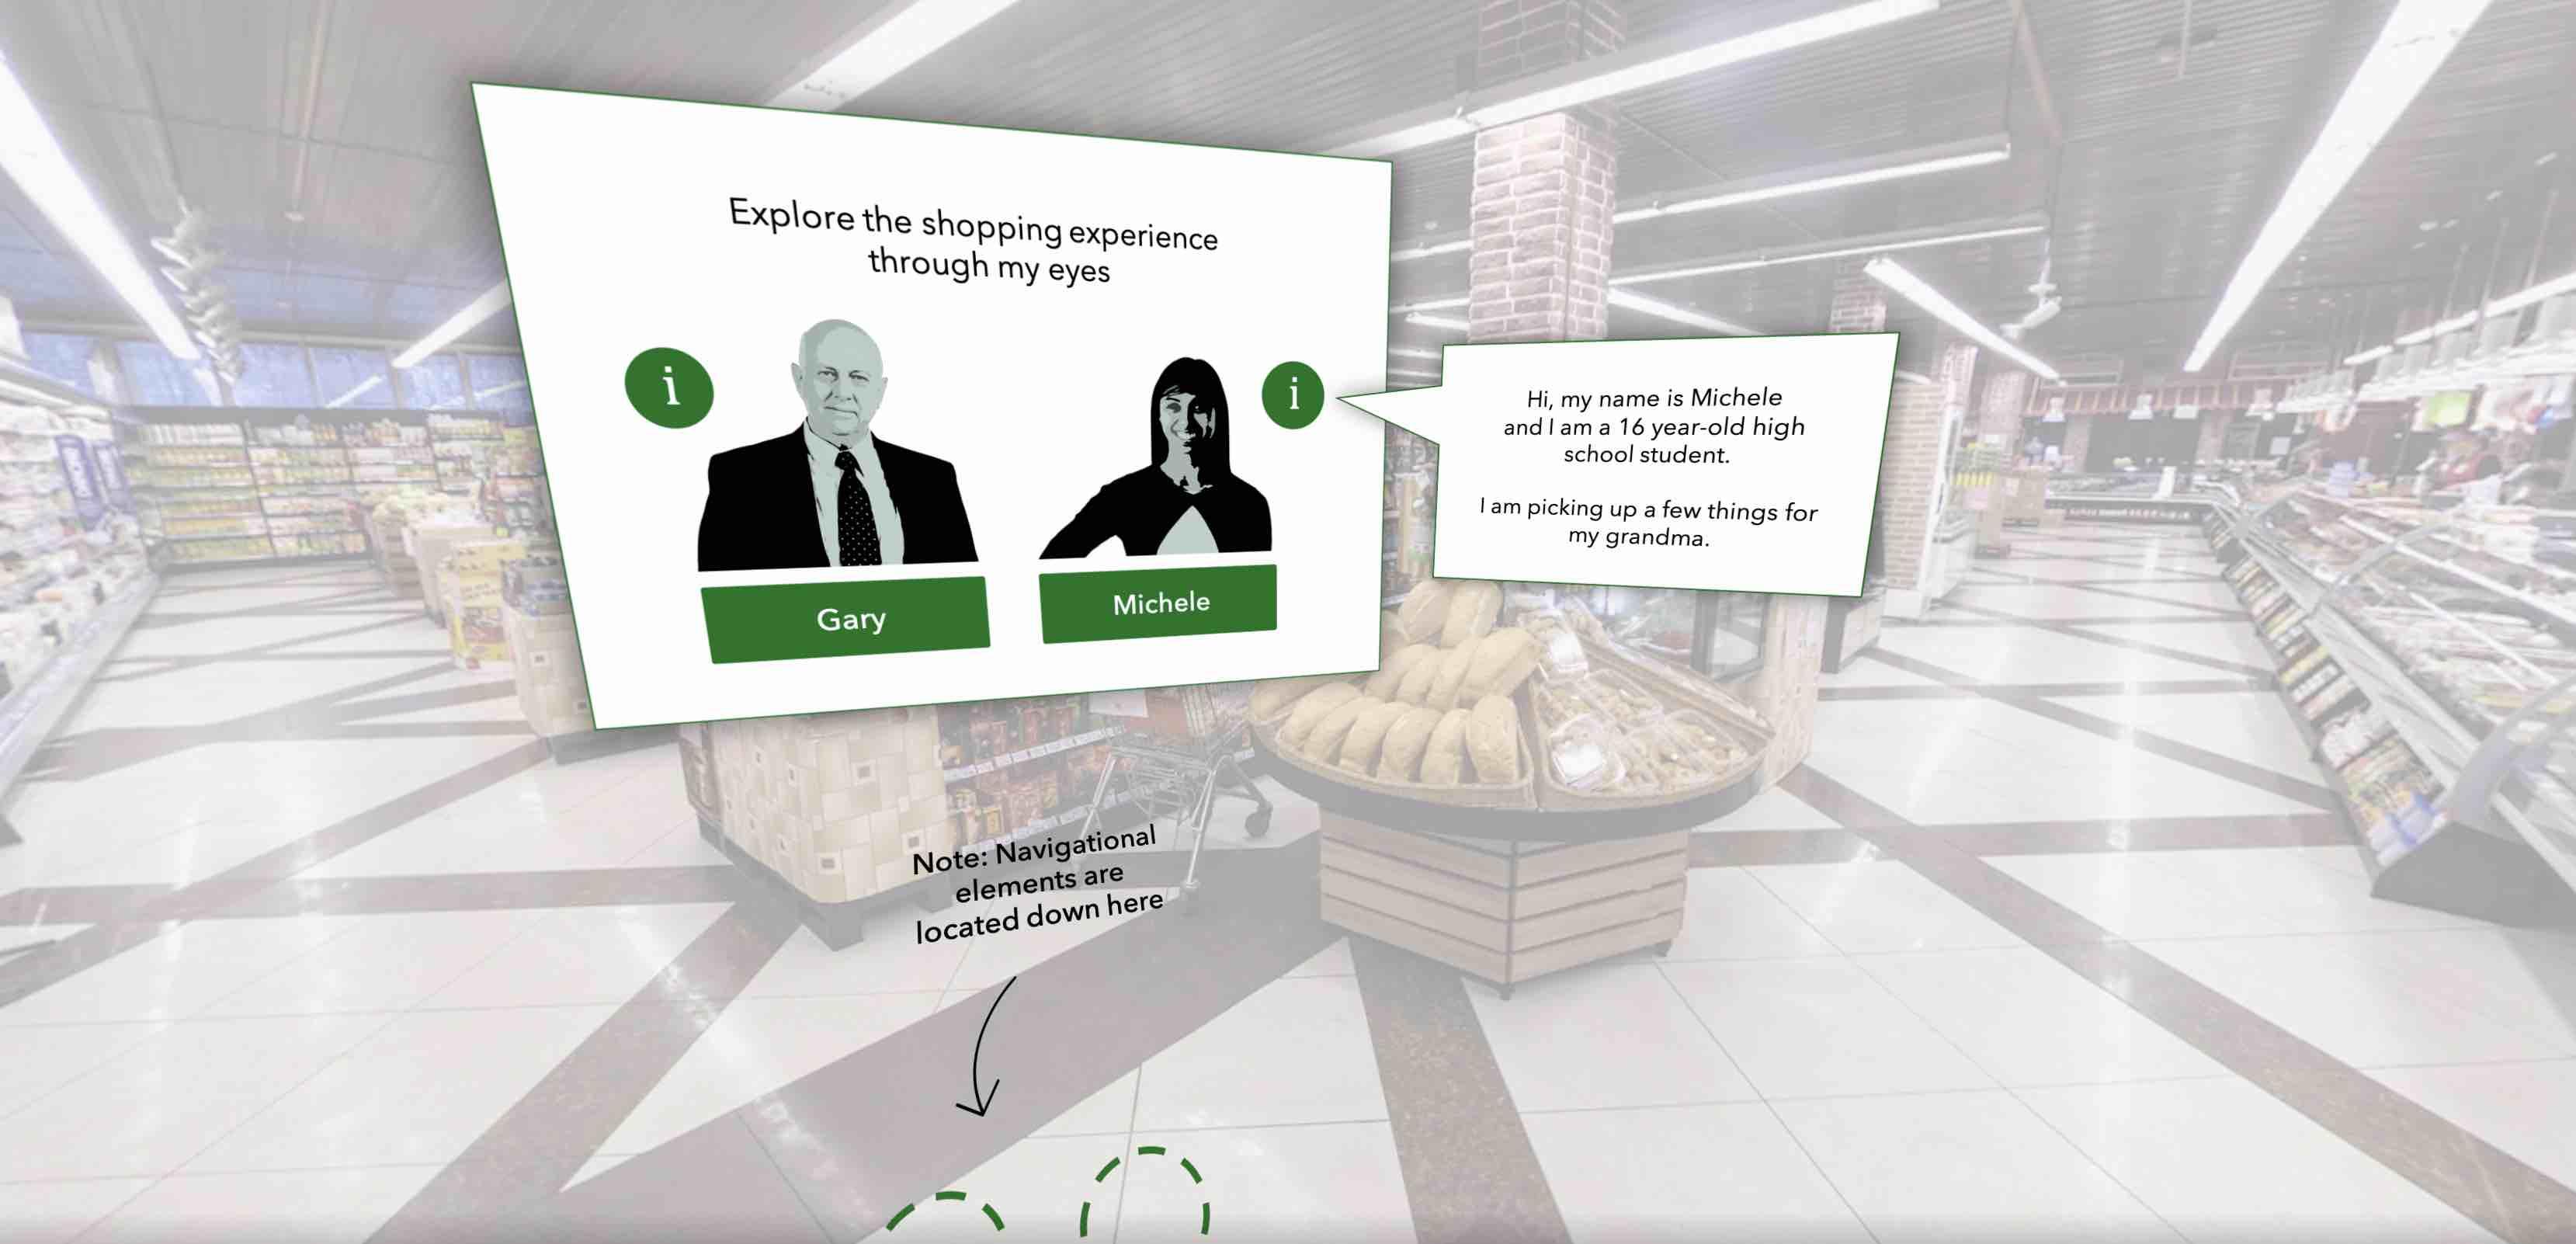 Food Market Customer Empathy Training 1 1024x494